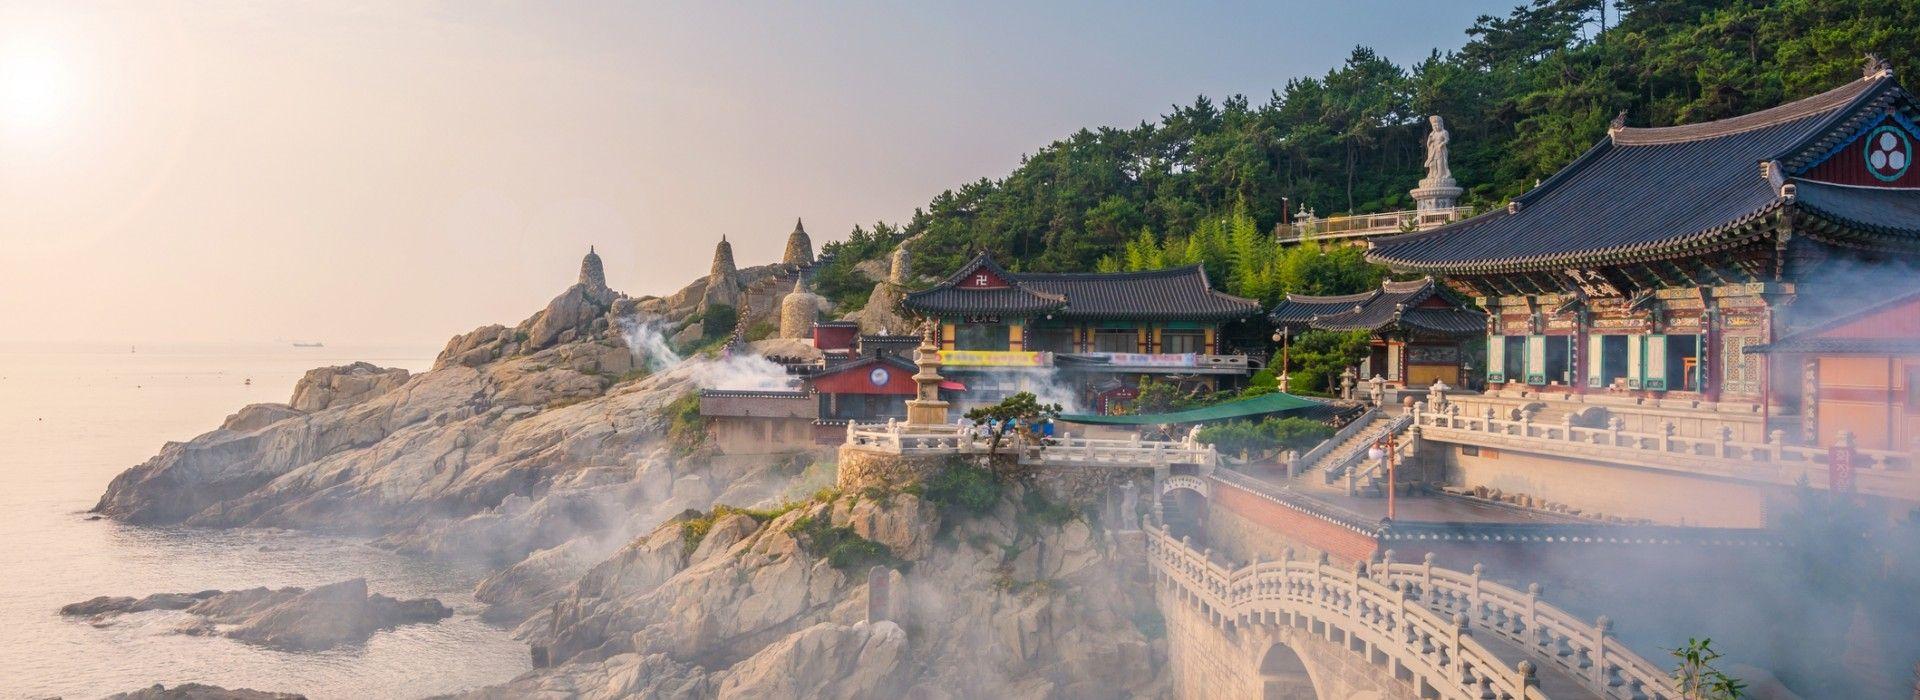 War sites Tours in South Korea